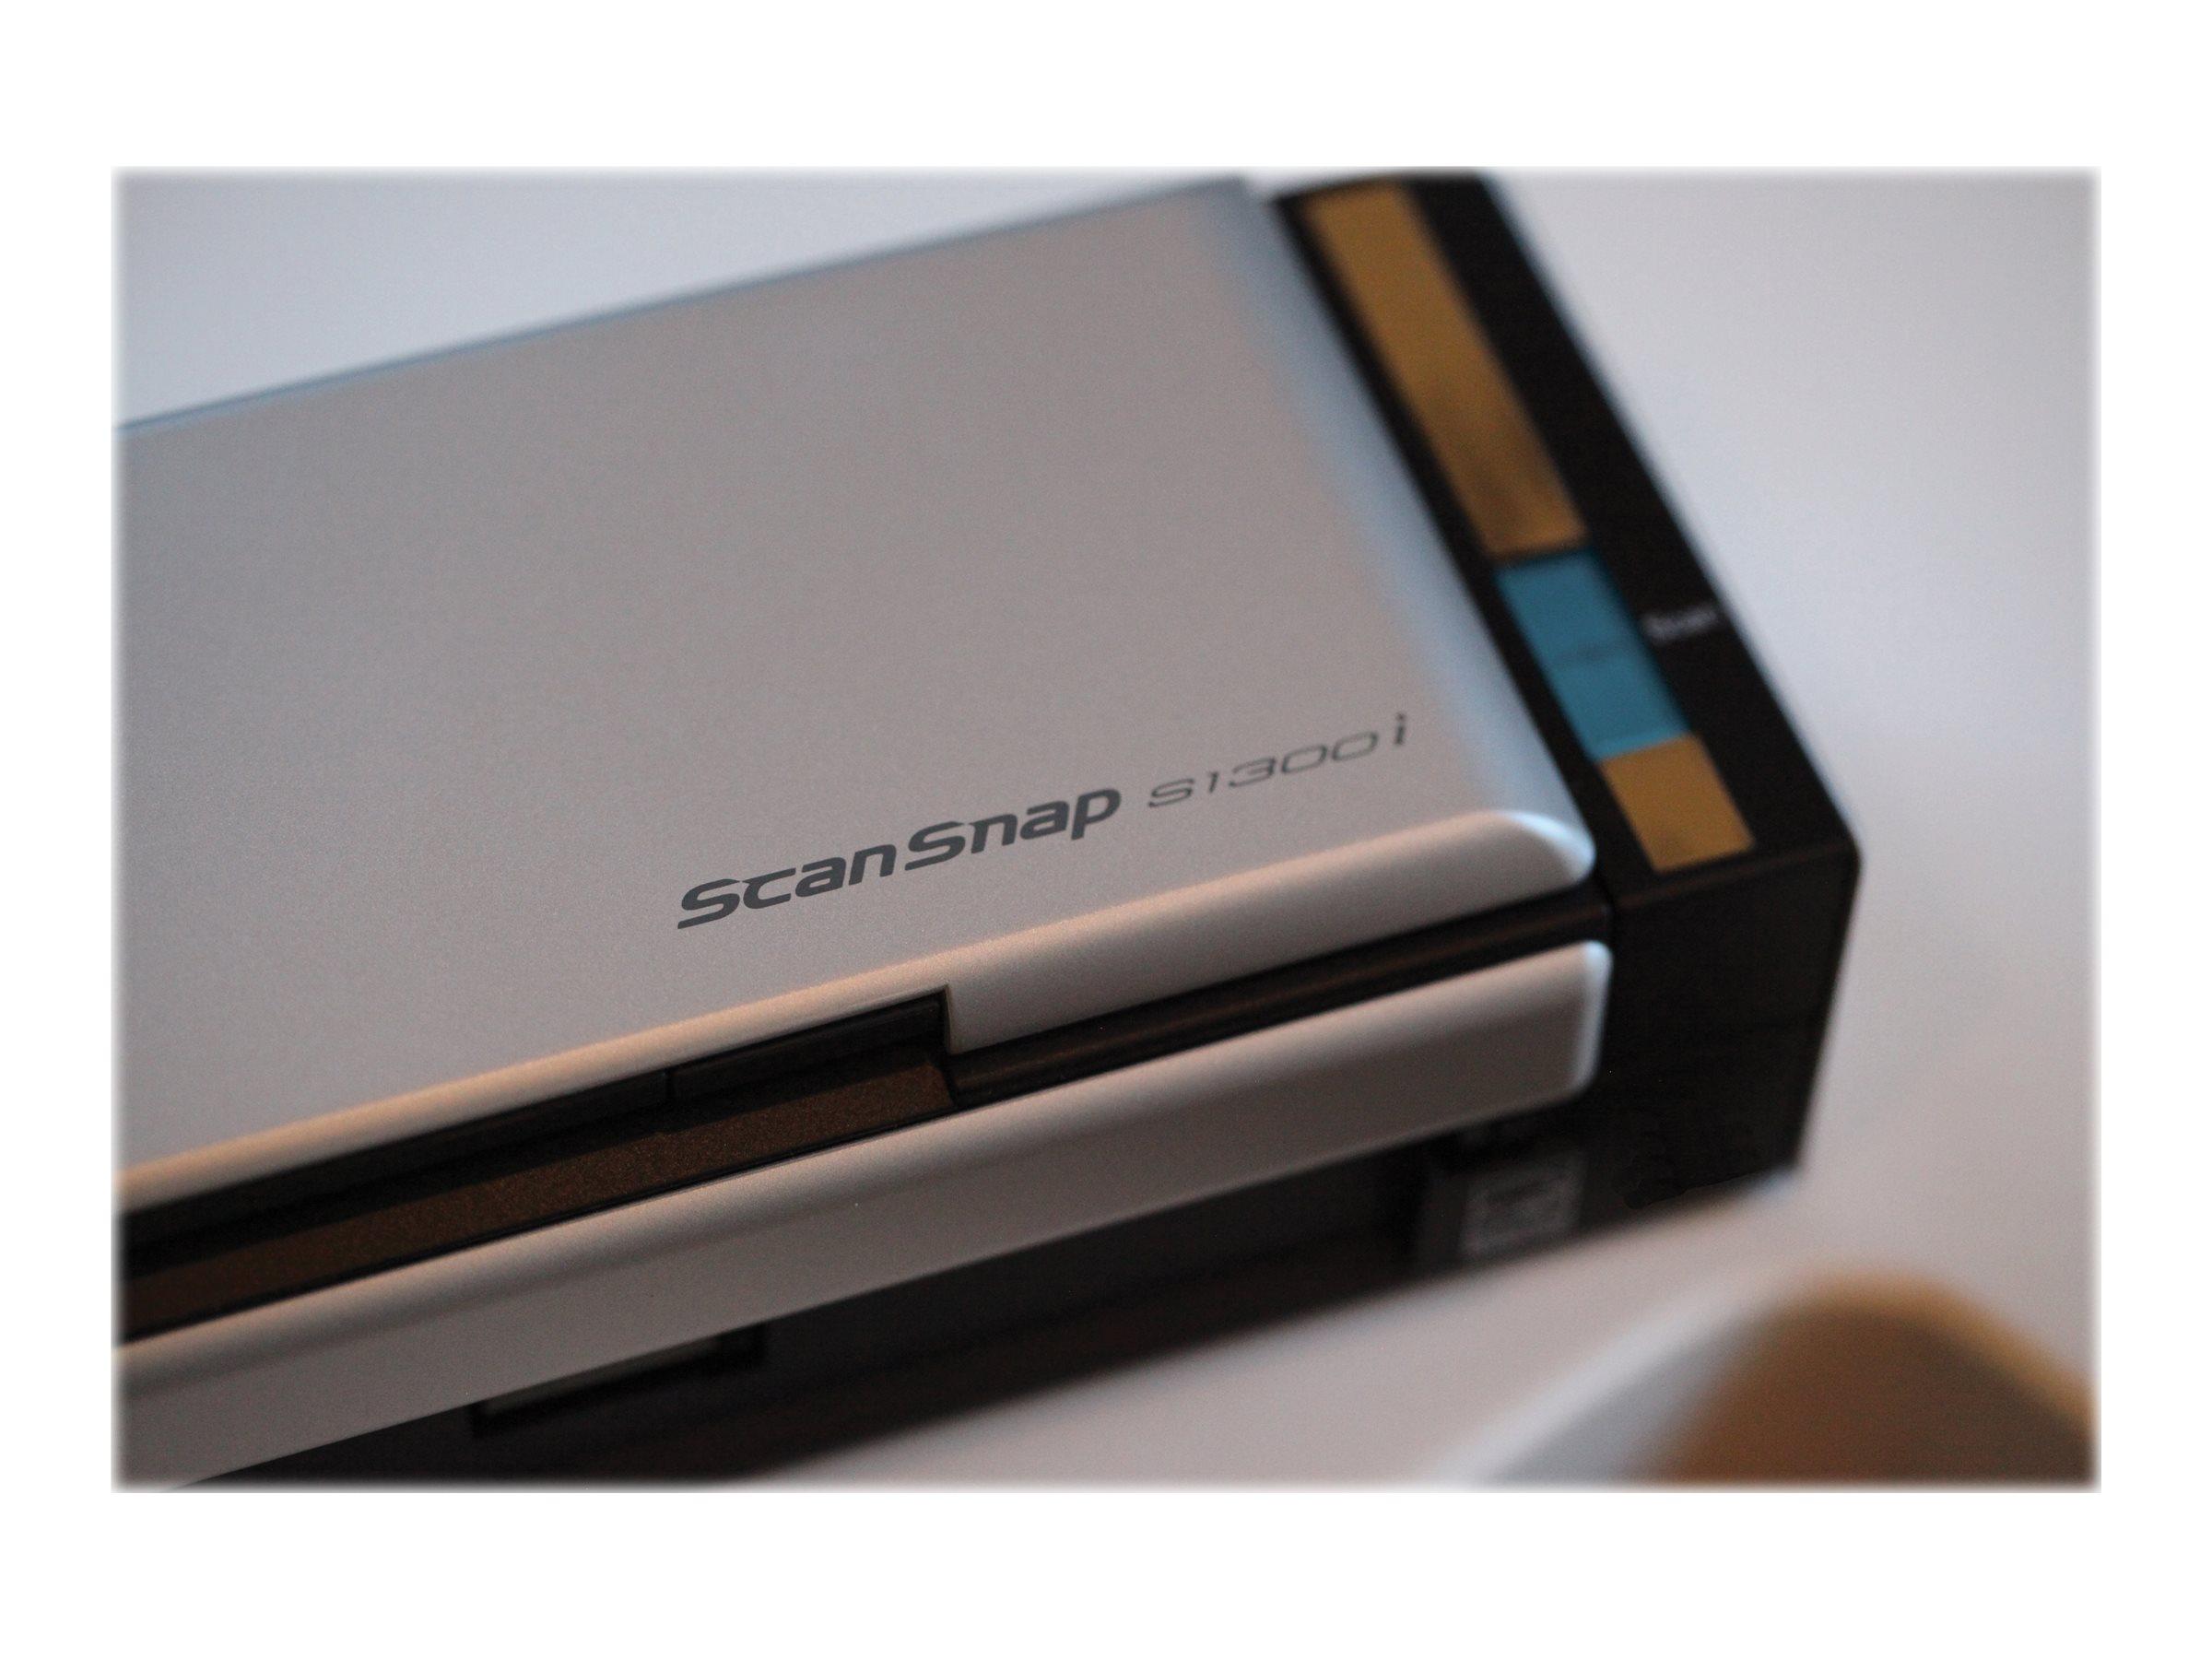 Fujitsu ScanSnap S1300i - document scanner - portable - USB 2.0 ...